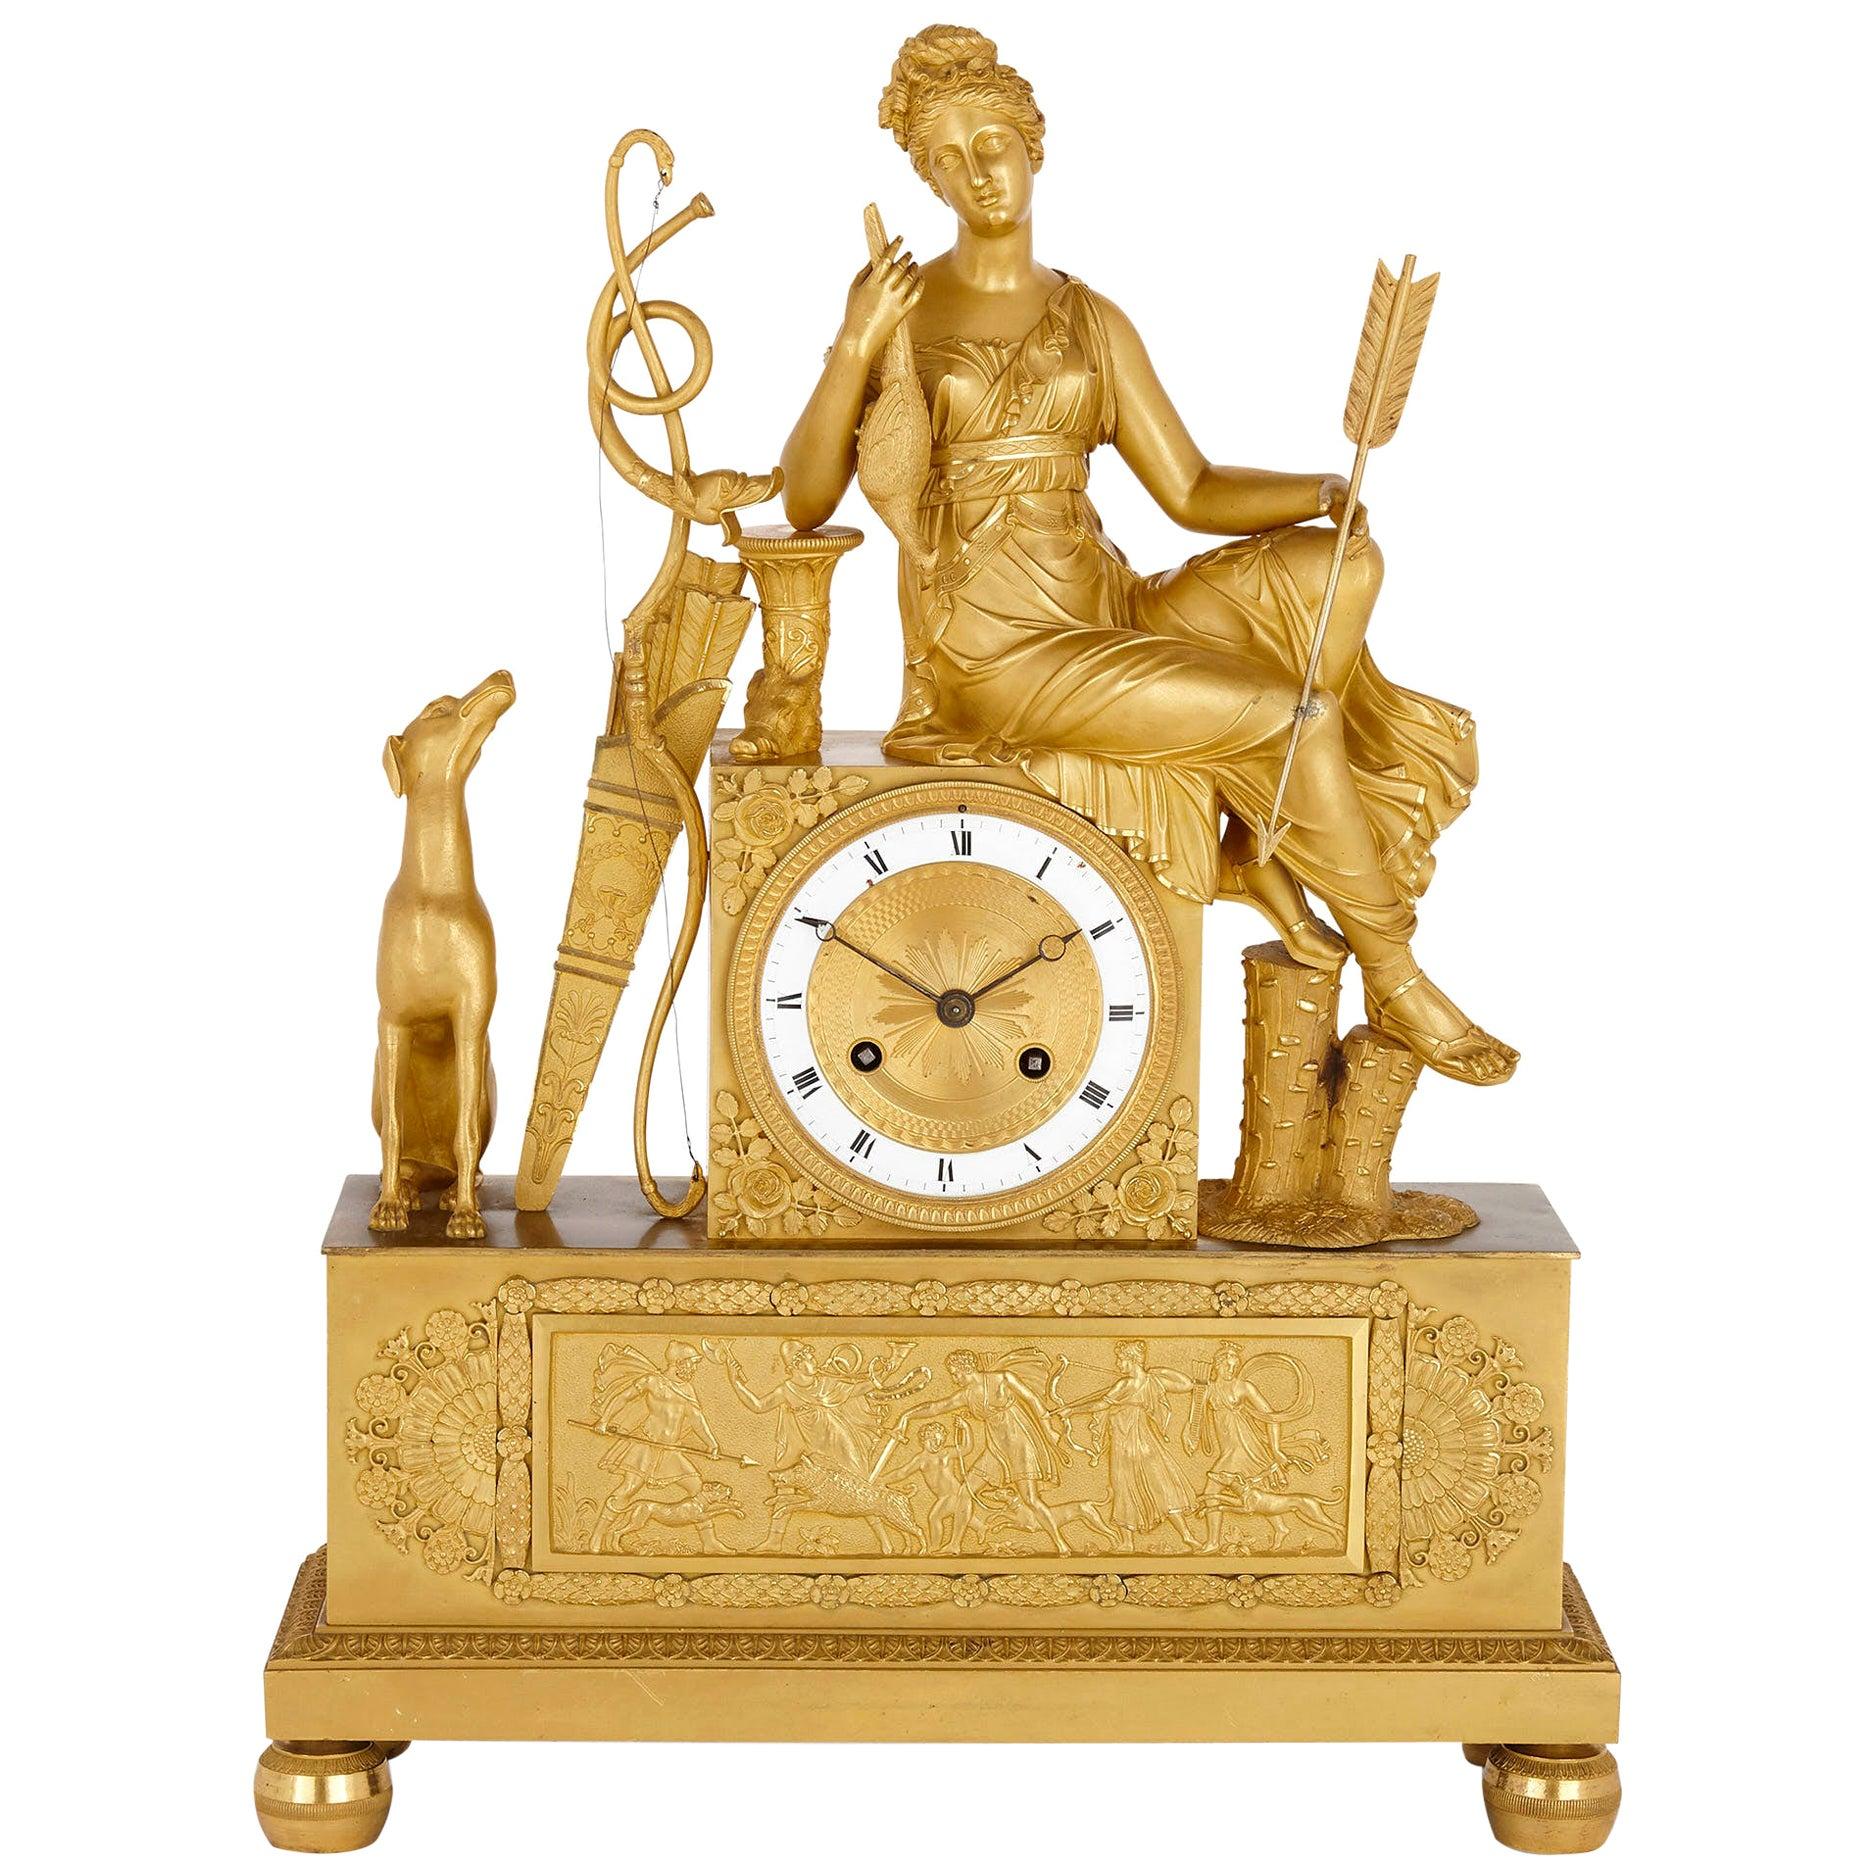 French Empire Period Gilt Bronze Mantel Clock